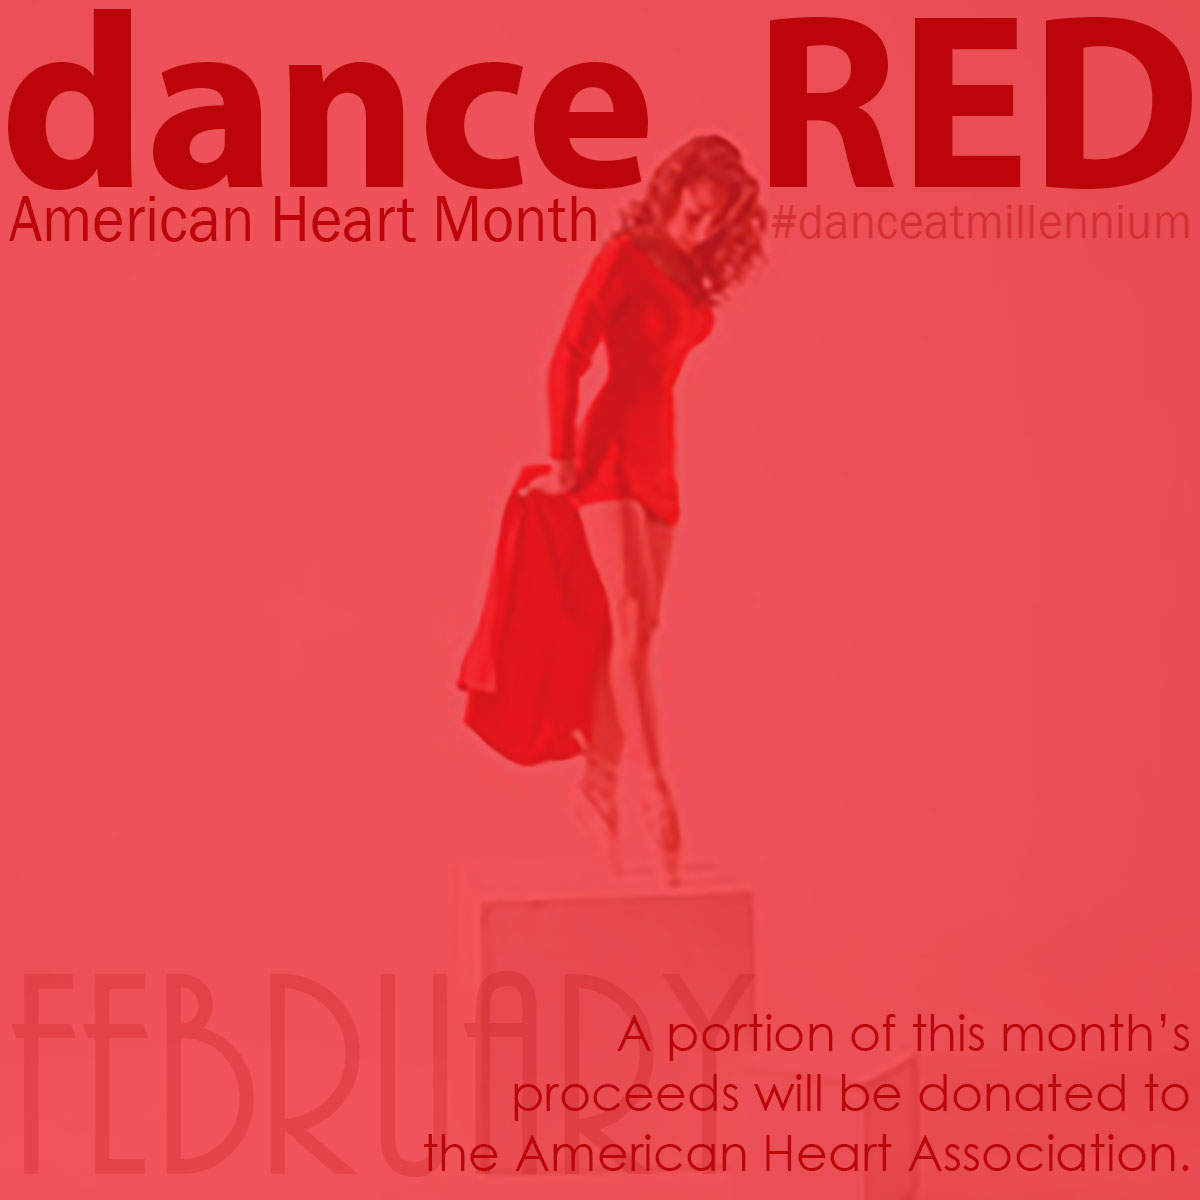 danceRED 2.1.19.jpg